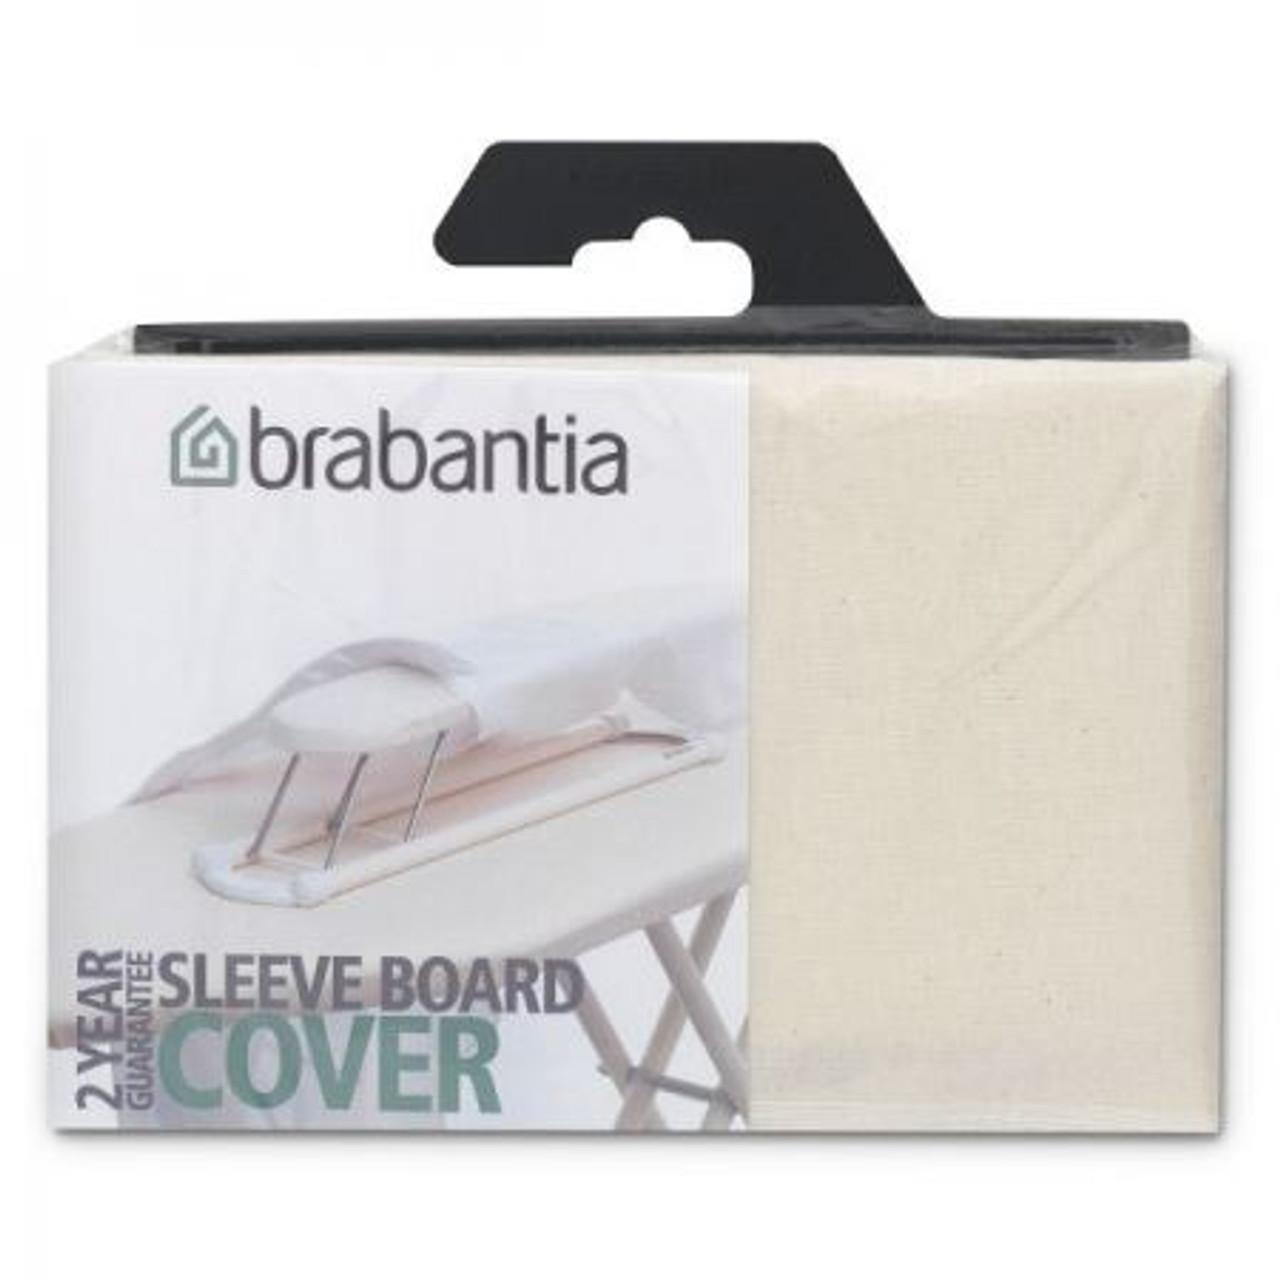 Brabantia Sleeve Board Cover